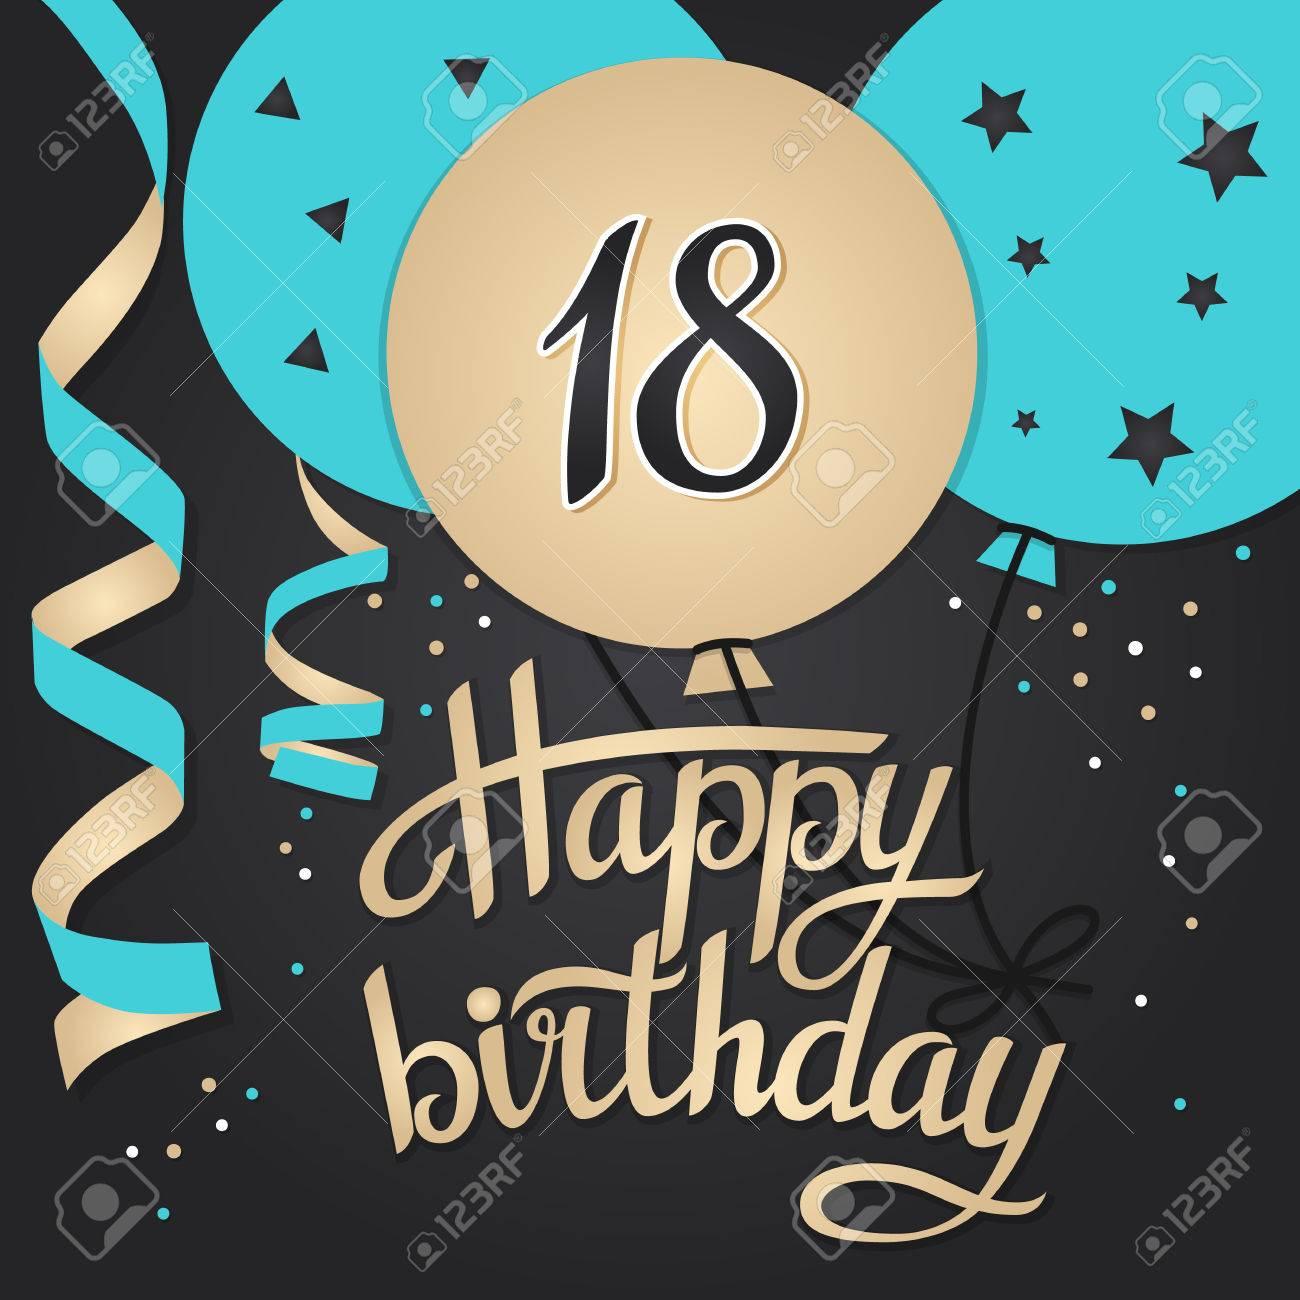 happy birthday 18 Happy Birthday Card Template With Balloons. 18 Years Vector  happy birthday 18